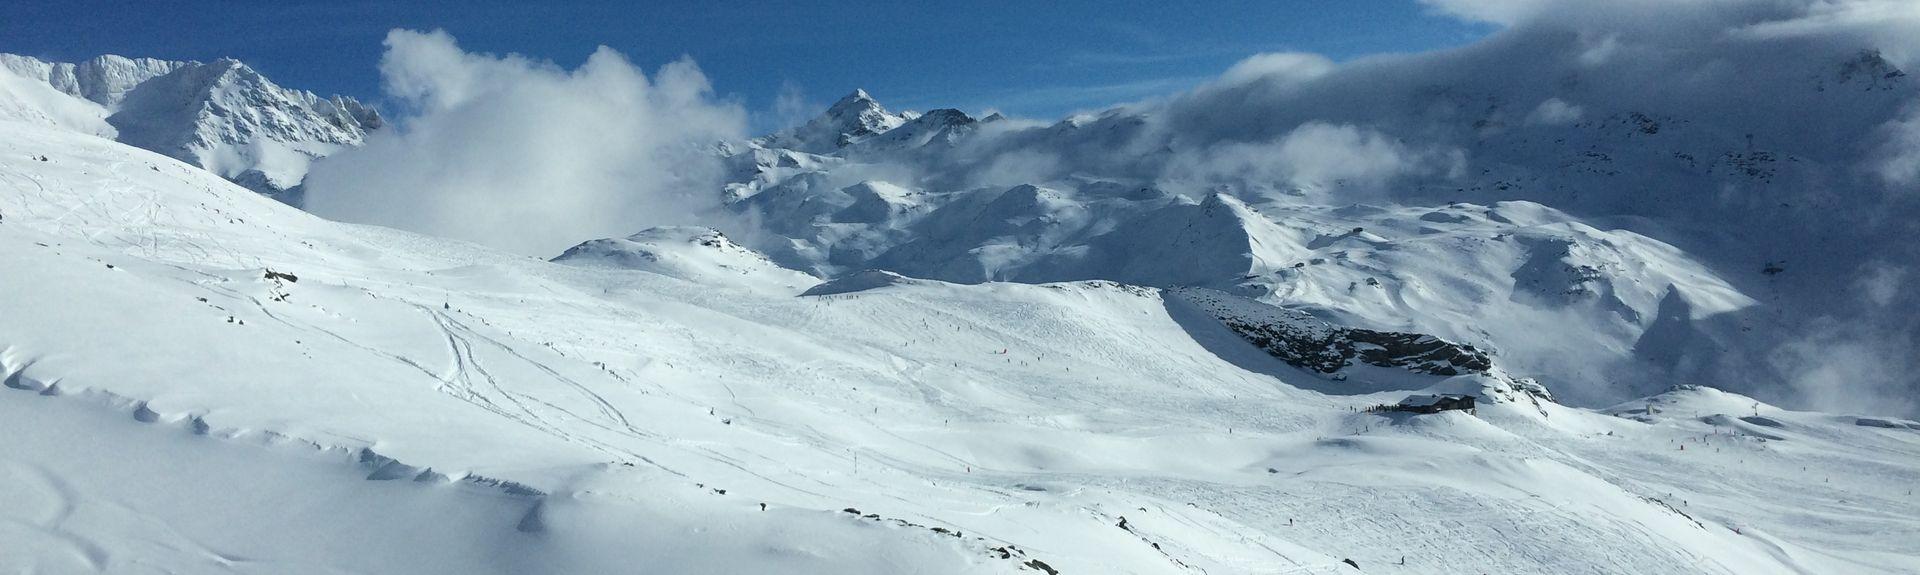 Saint-Jean-de-Maurienne, Alvernia-Rodano-Alpi, Francia